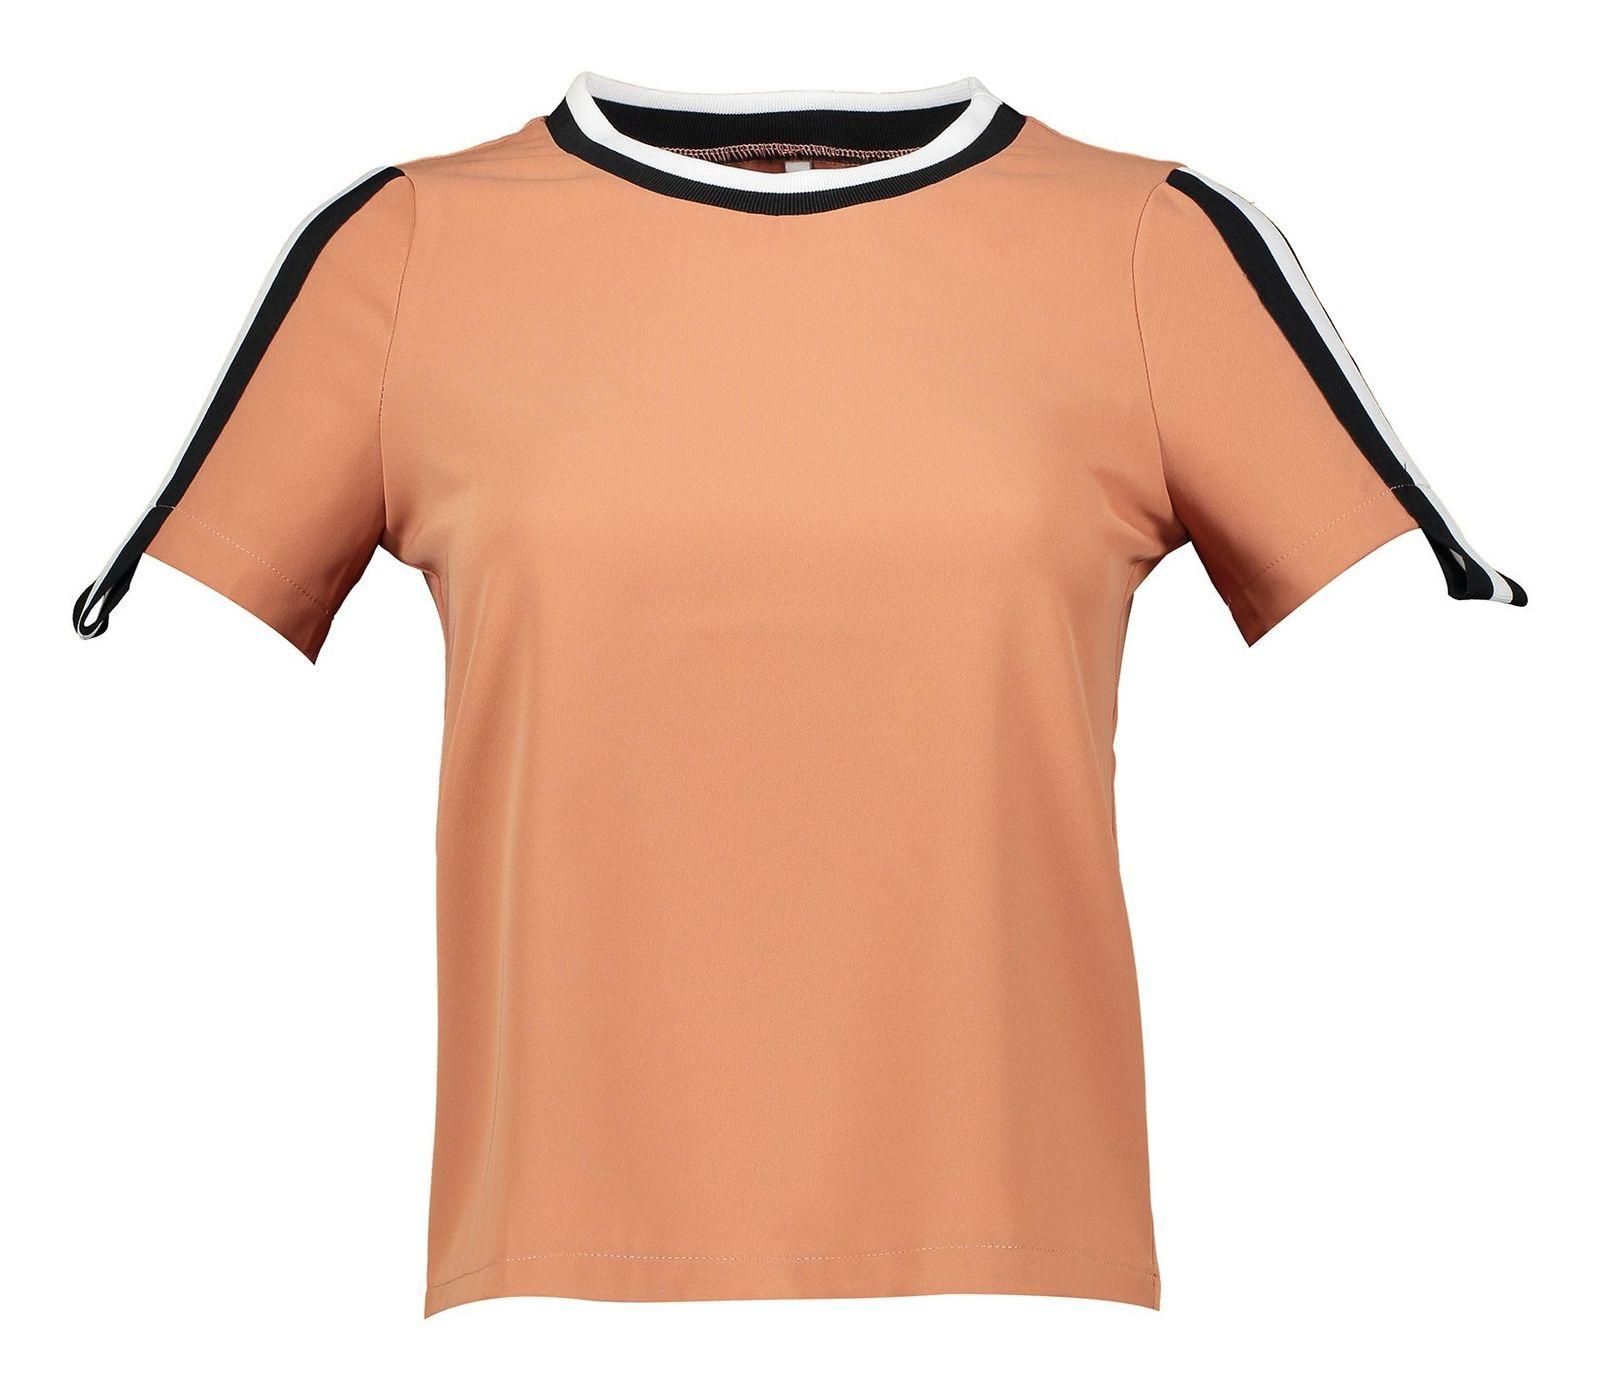 تی شرت یقه گرد زنانه - امپریال - نارنجي تيره - 3